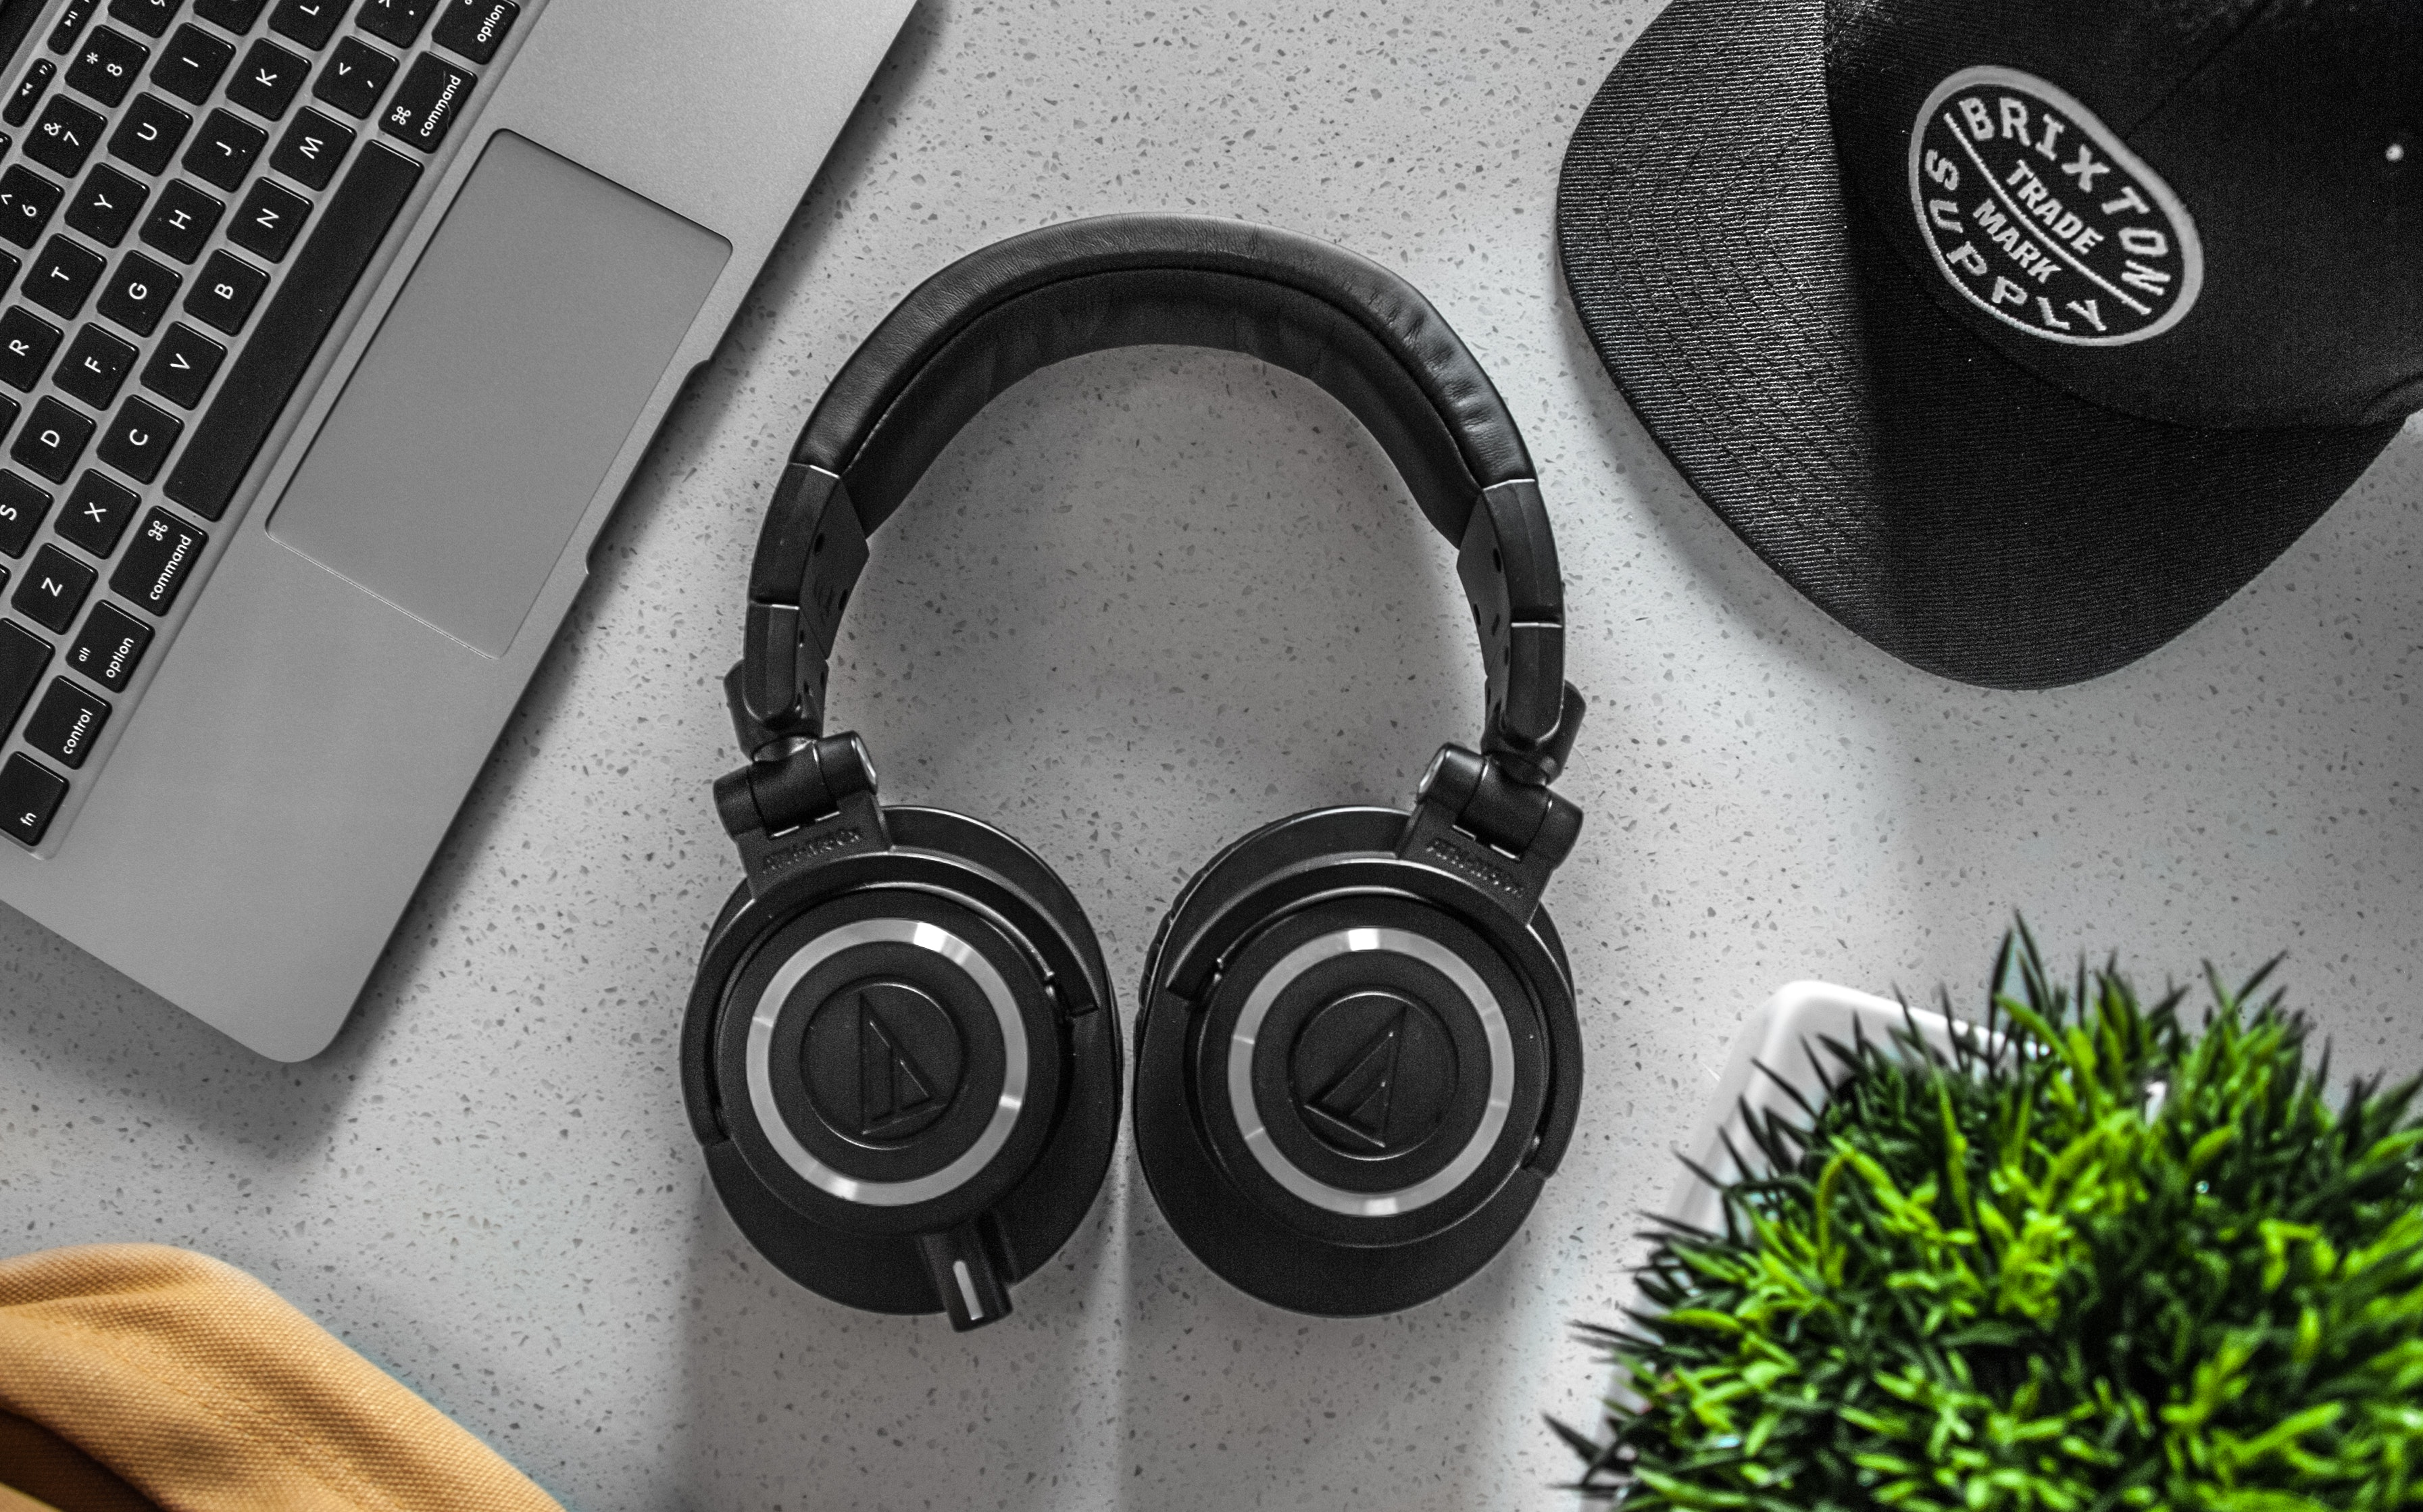 Black Wireless Headphones On White Table, Cap, Computer, Electronics, Equipment, HQ Photo